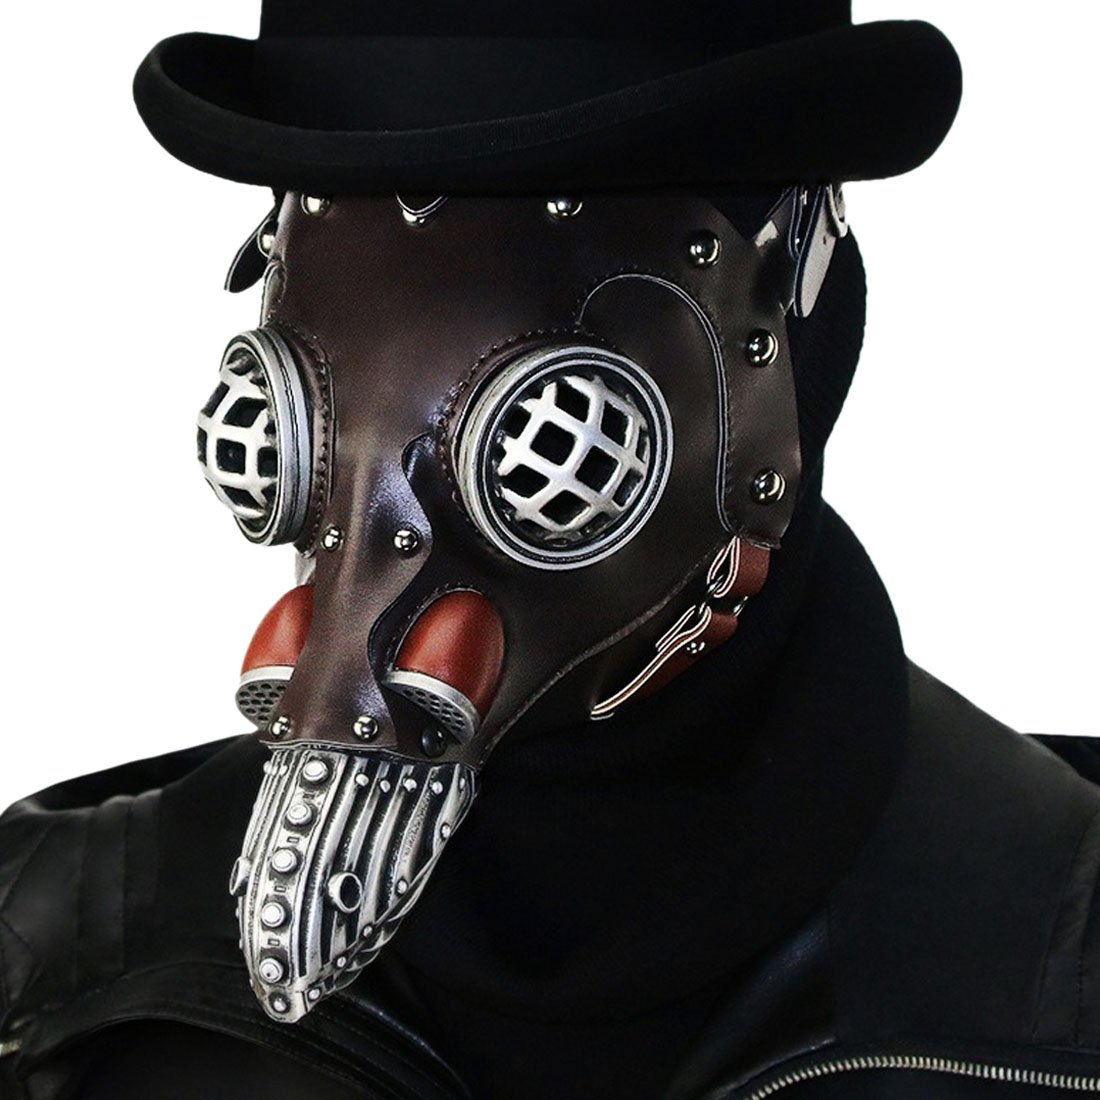 QIYUN.Z Pest Schnabel Maske Gothic Cosplay Retro Doktor Vogelmaske PU-Leder Maske (HG104)